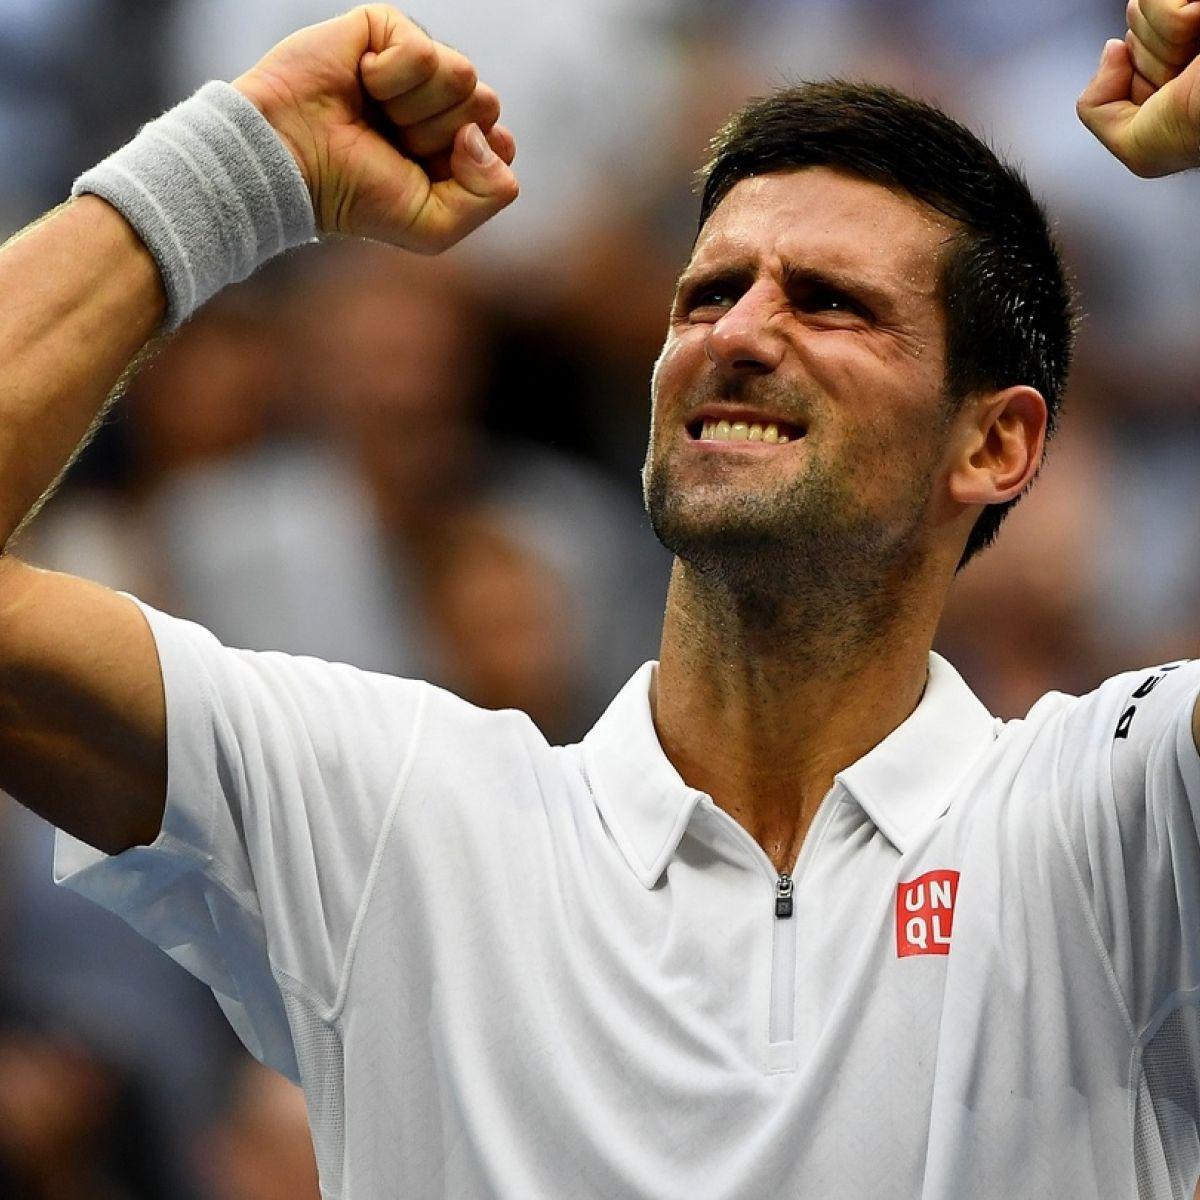 Novak Djokovic Sees Off Gael Monfils To Make Us Open Final